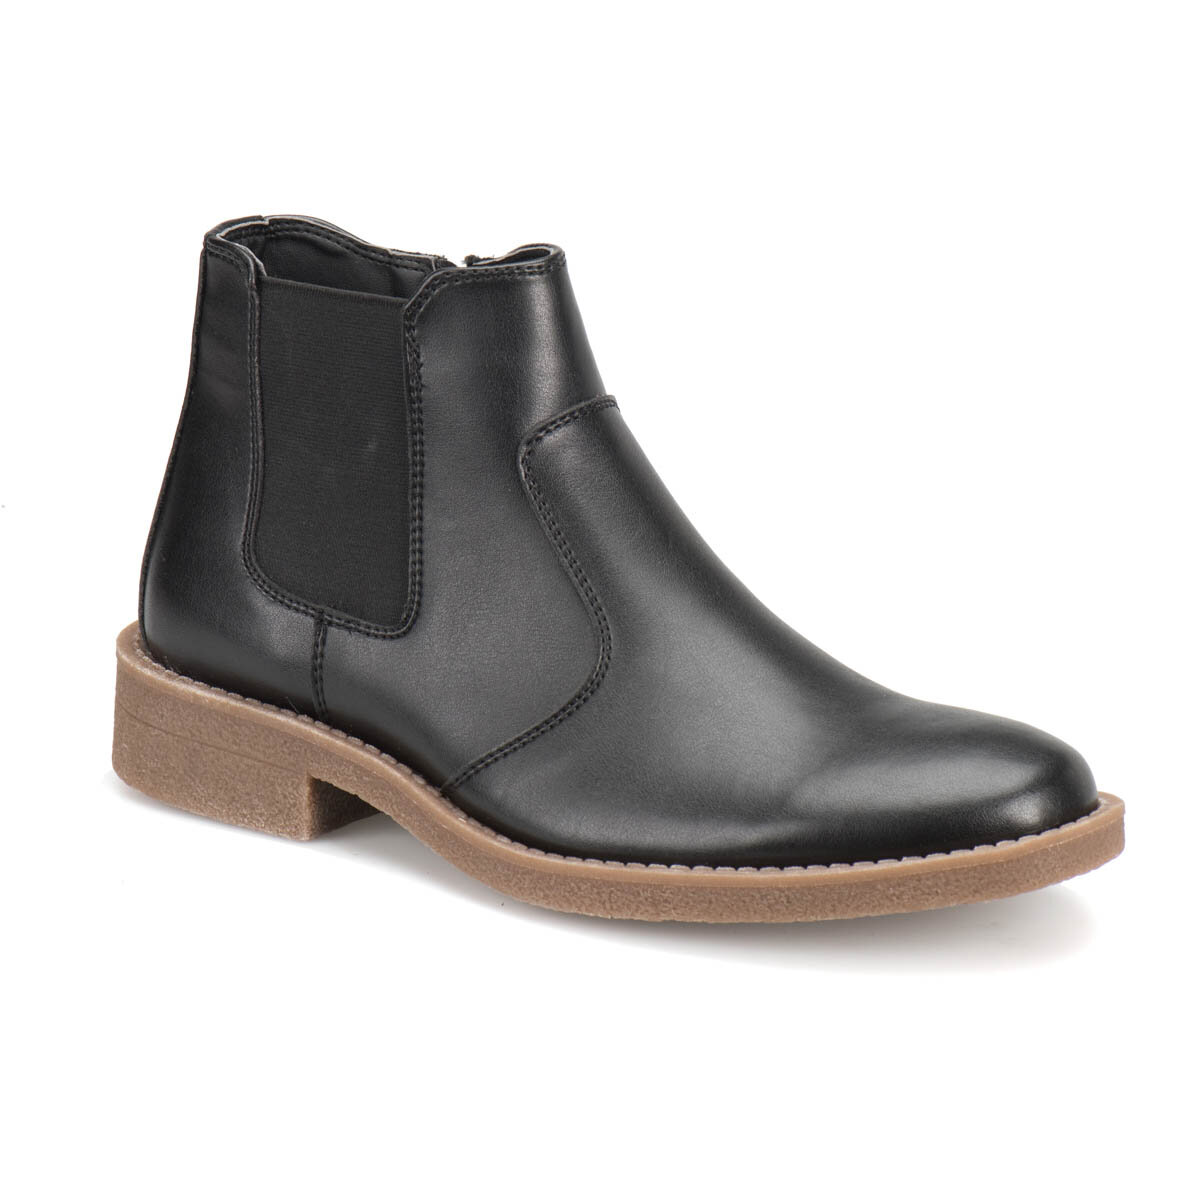 FLO 22945 Brown Men Boots Garamond